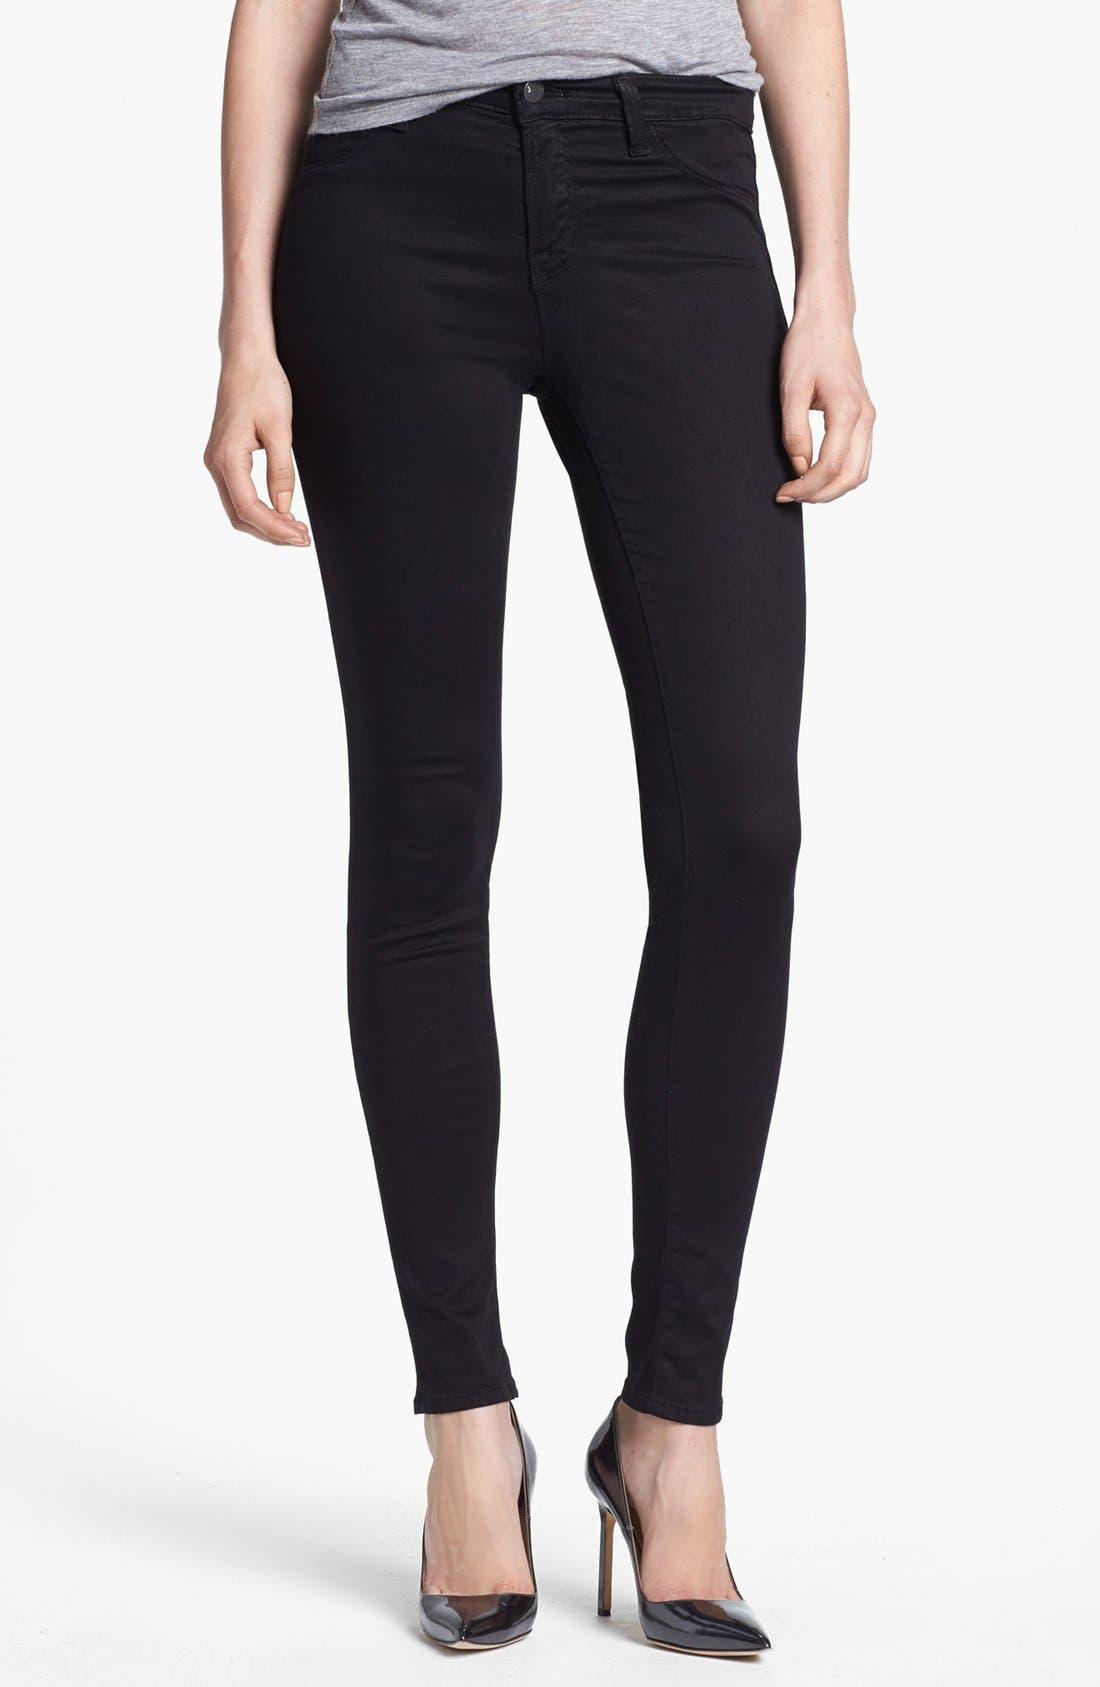 J BRAND '485' Mid Rise Super Skinny Jeans, Main, color, 103